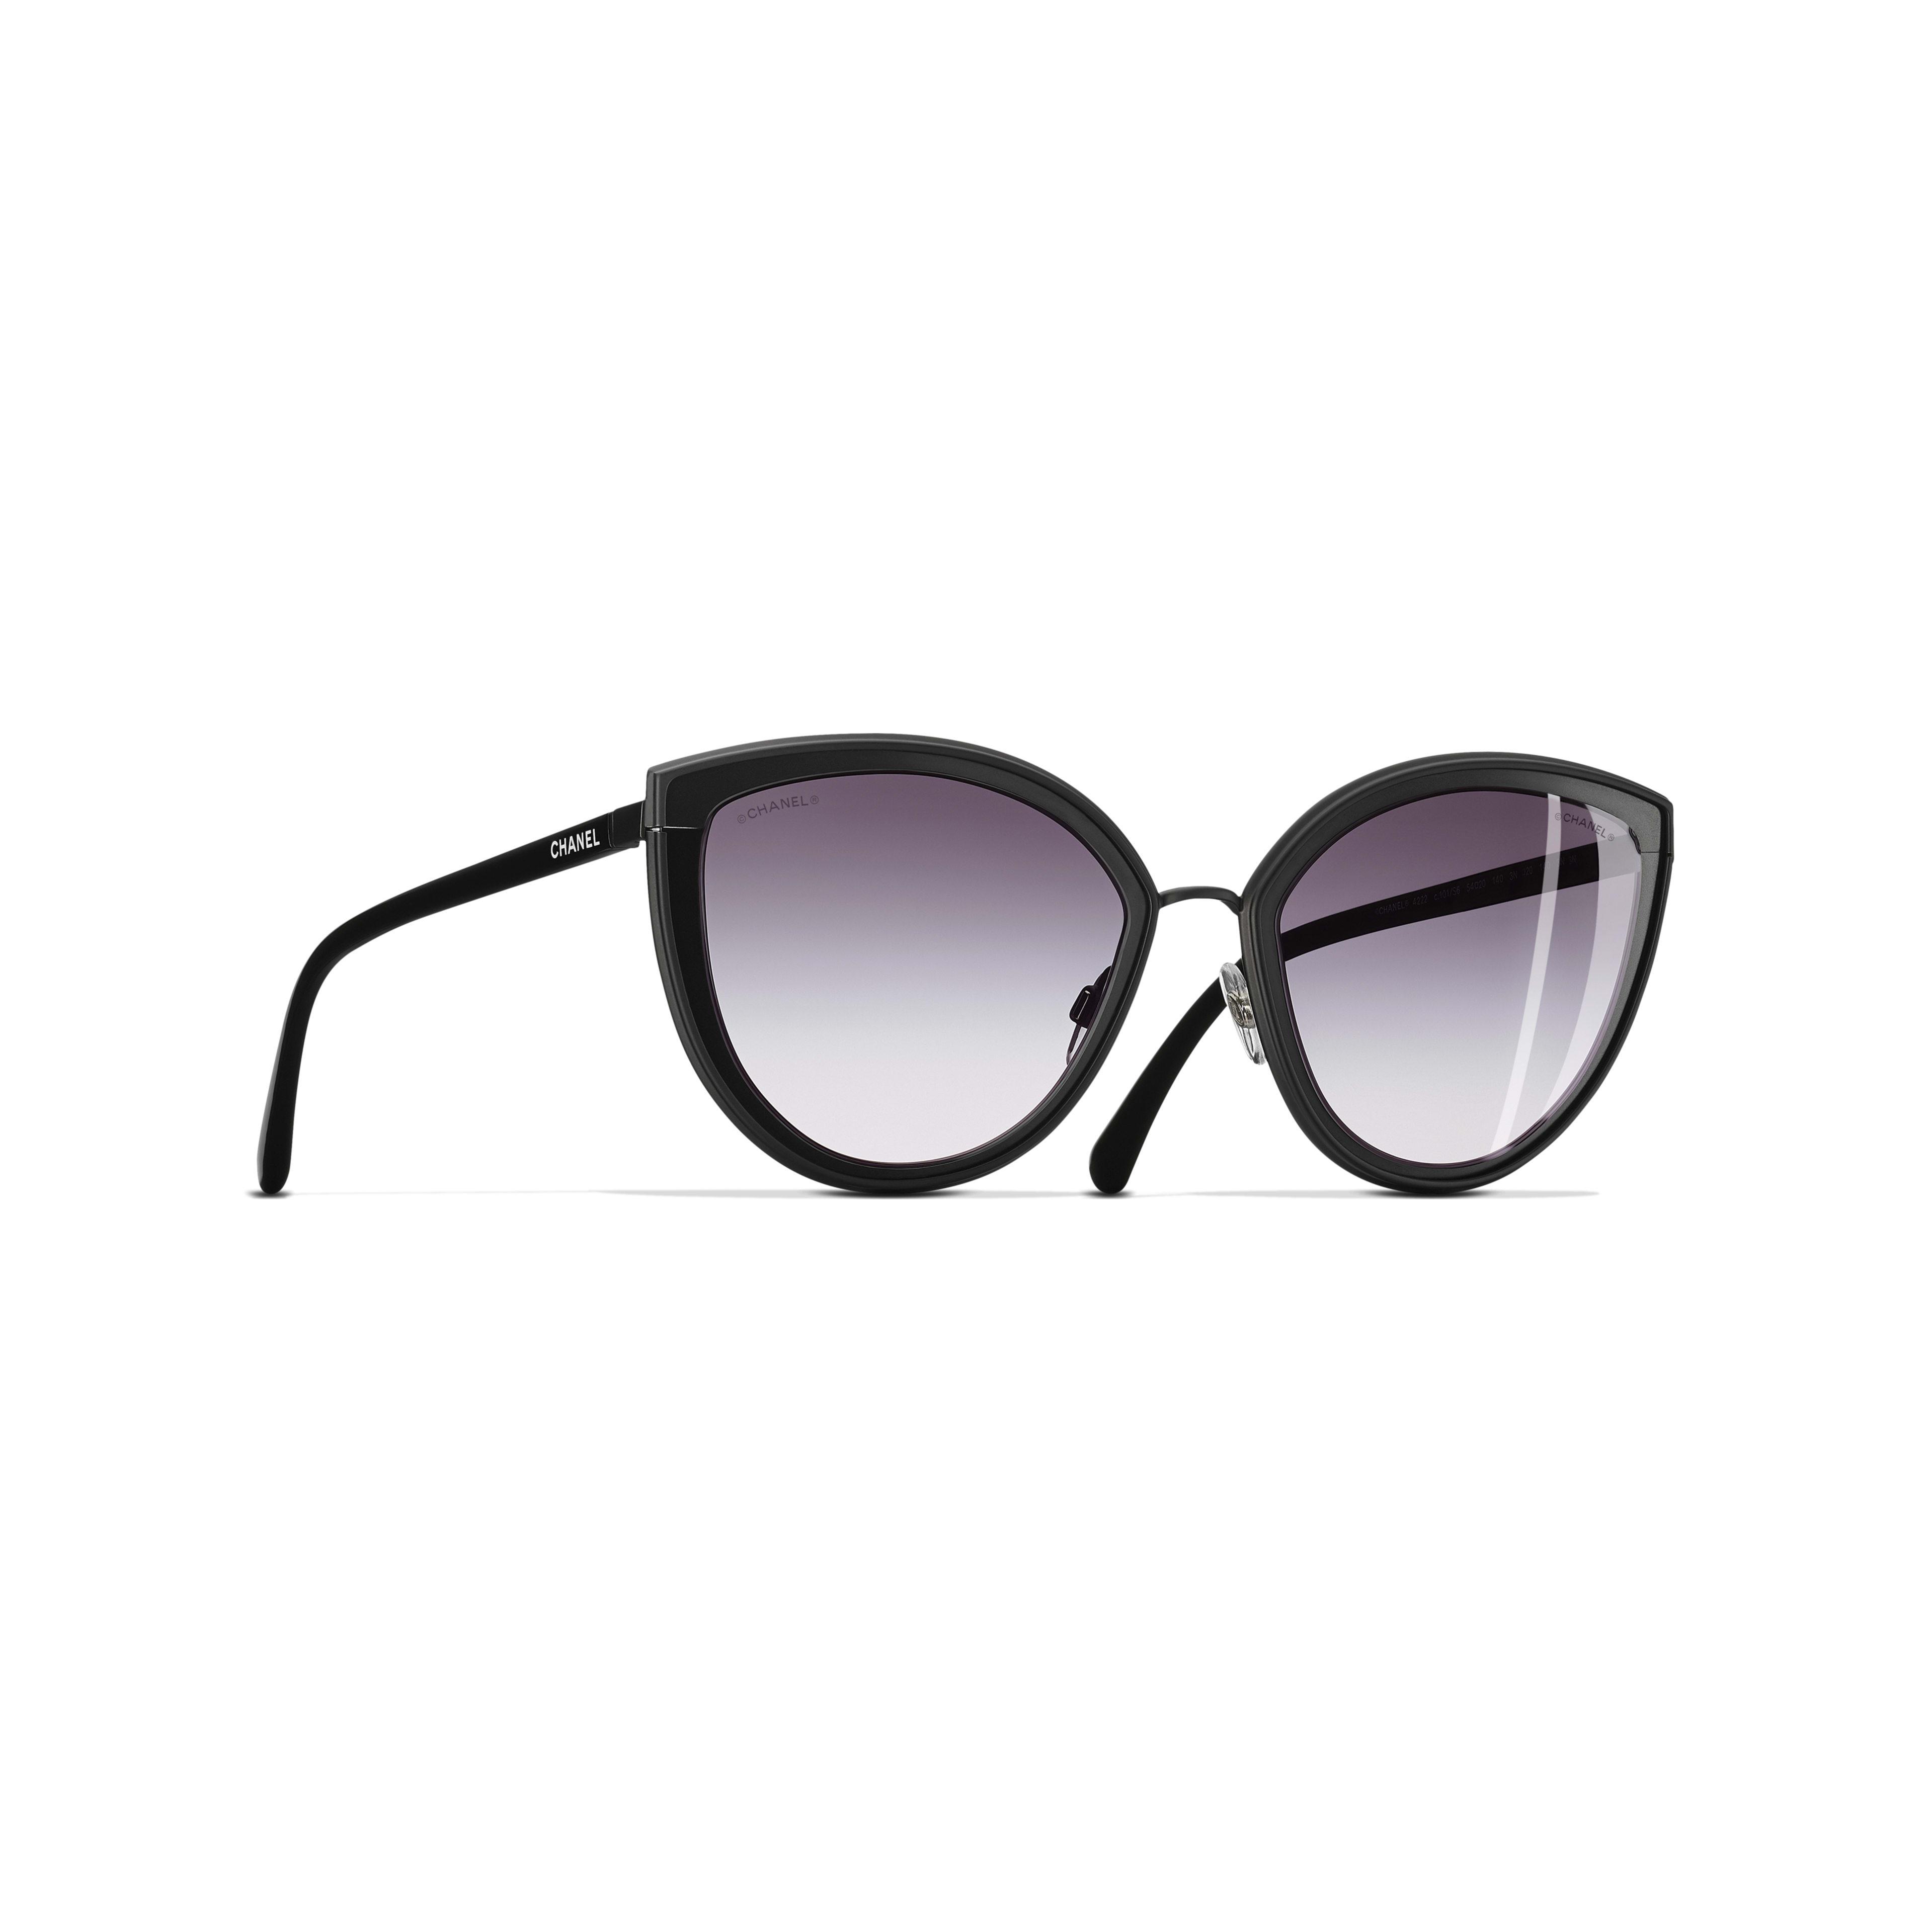 Cat Eye Sunglasses Metal Black -                                               view 1 - see full sized version